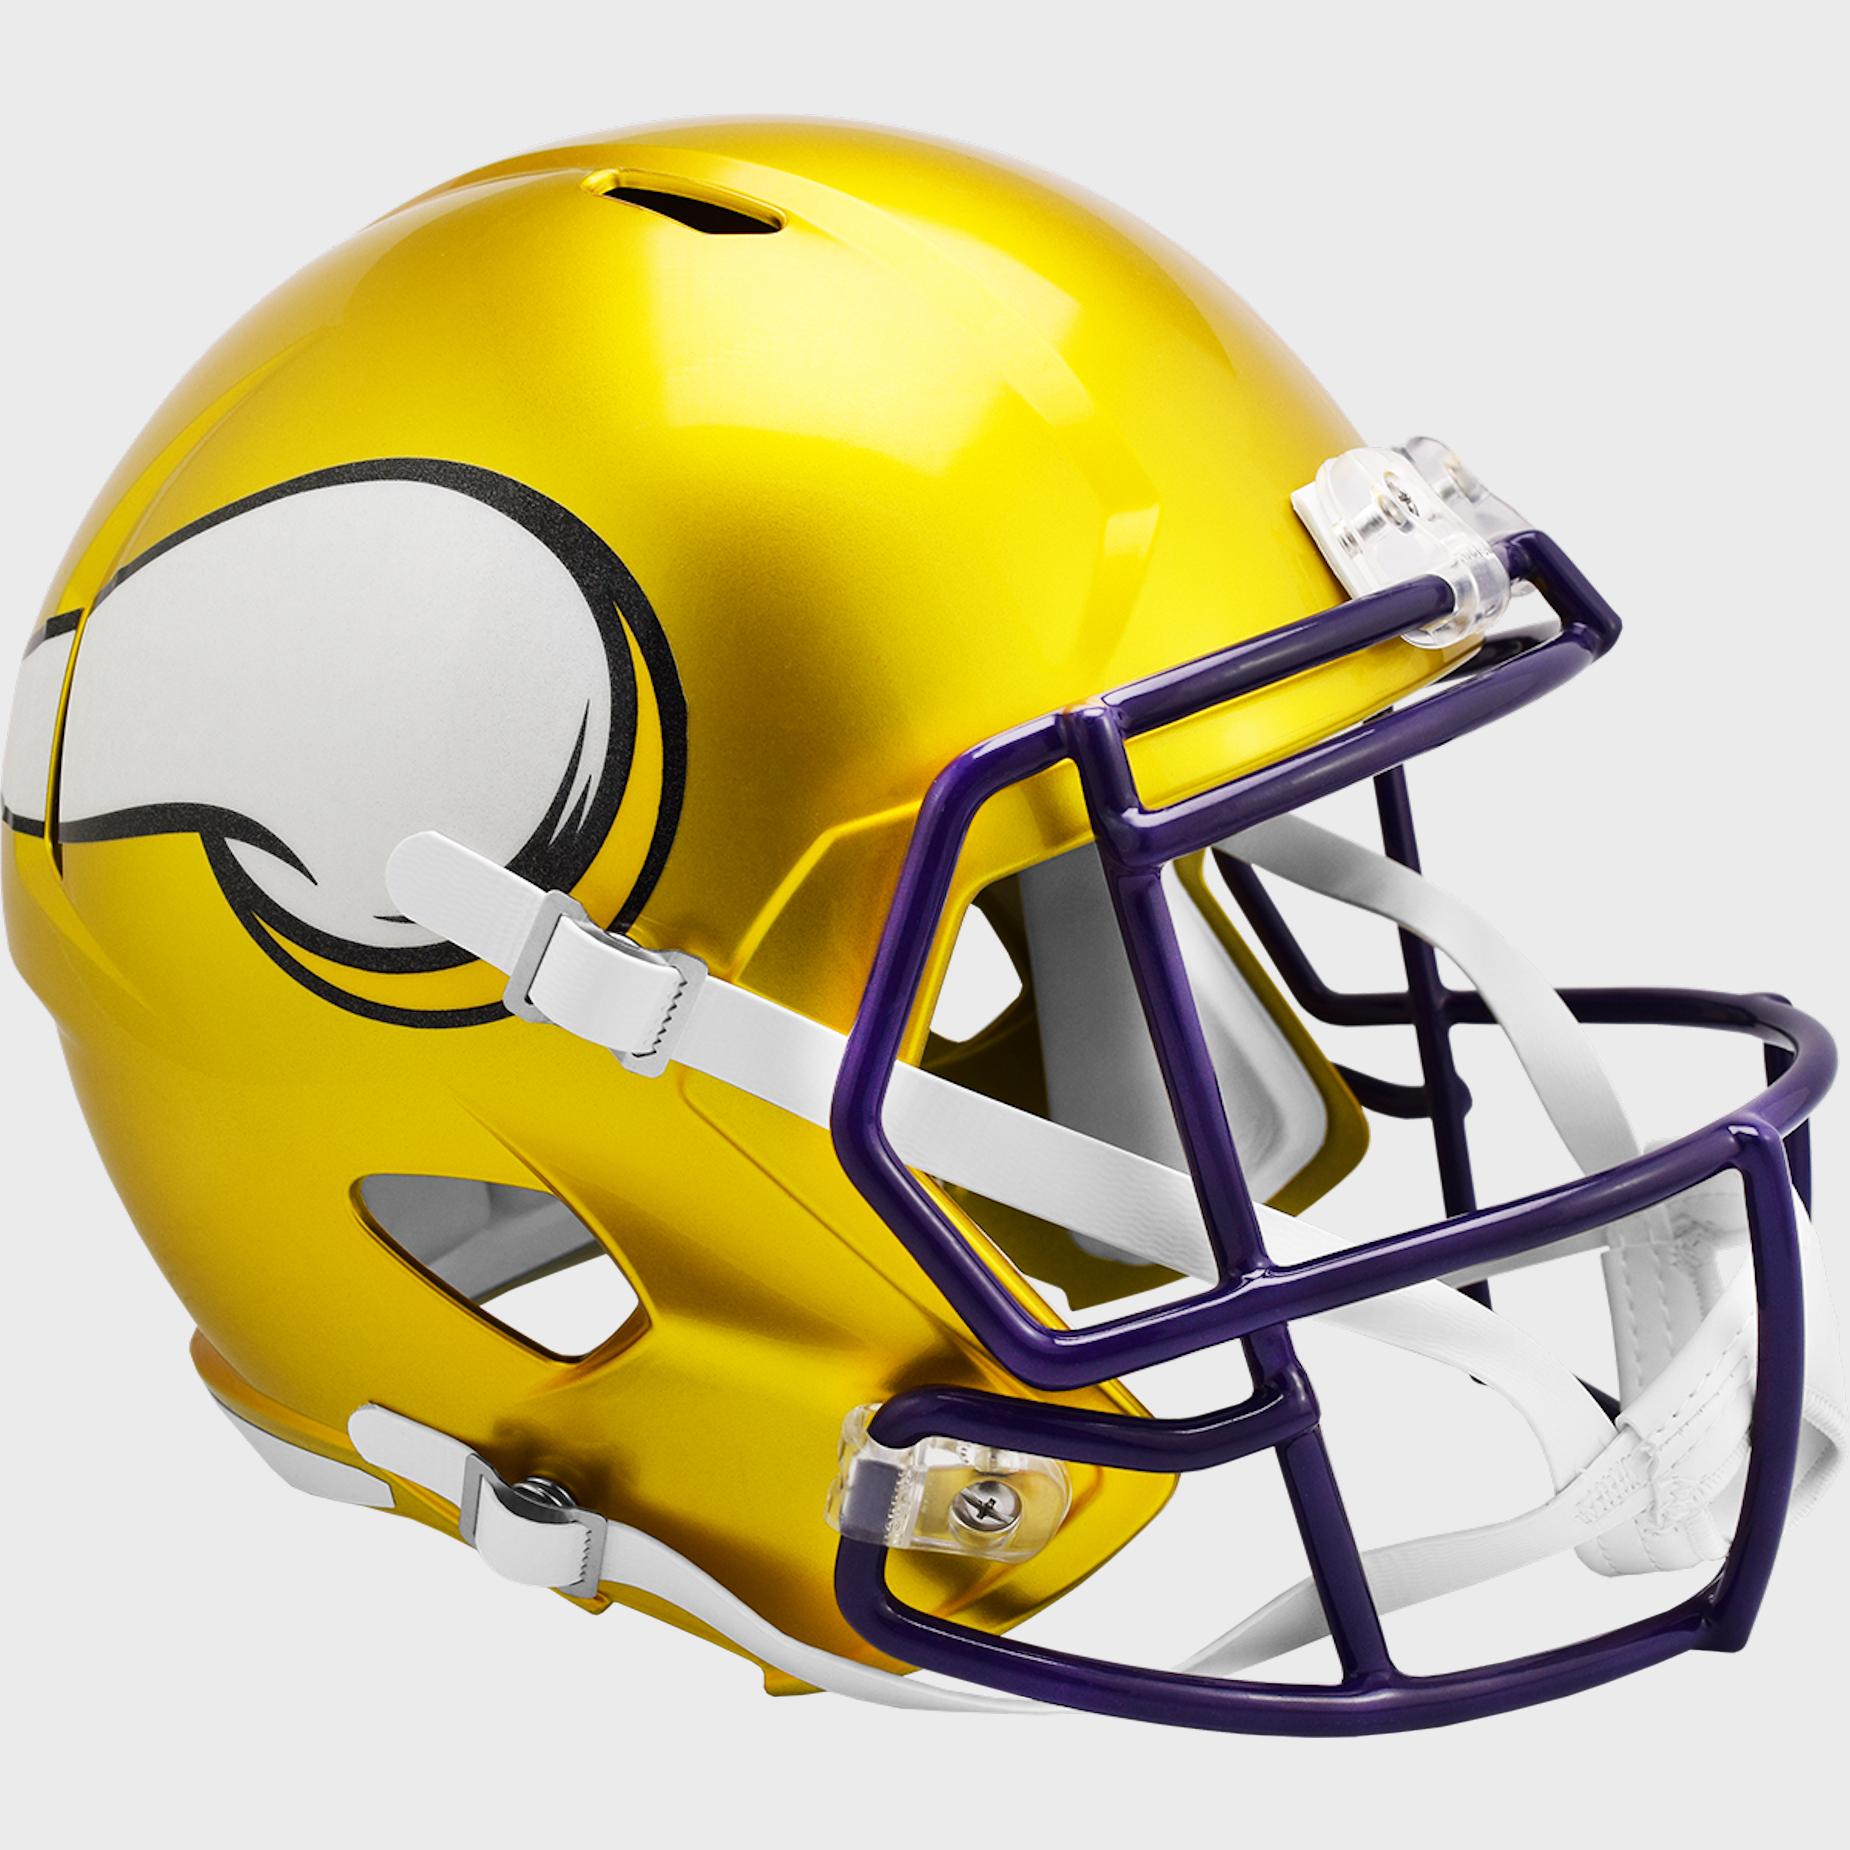 Minnesota Vikings Speed Replica Football Helmet <B>FLASH ESD 8/21/21</B>